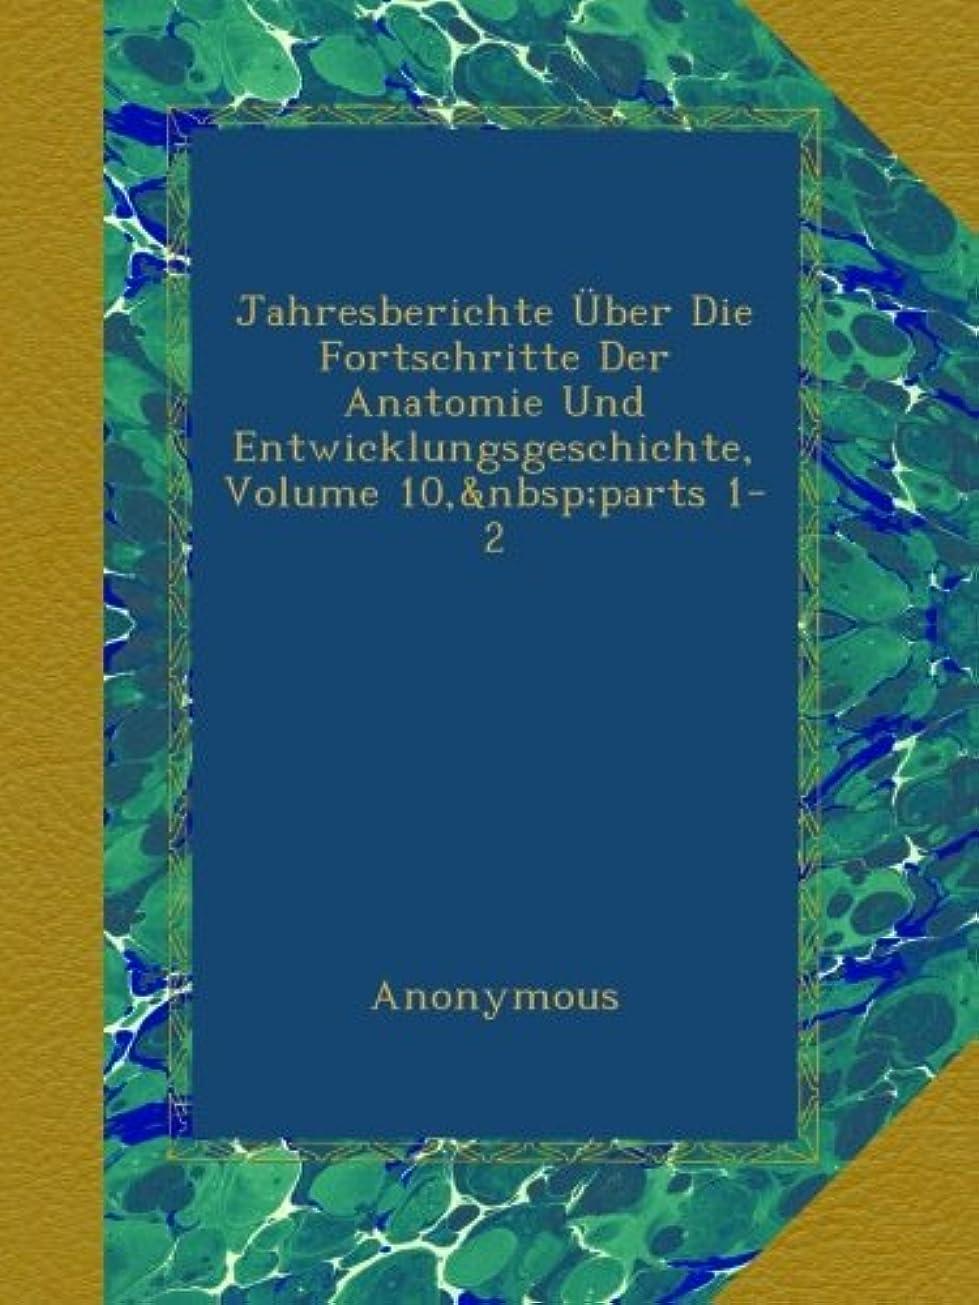 防腐剤考古学者突っ込むJahresberichte Ueber Die Fortschritte Der Anatomie Und Entwicklungsgeschichte, Volume 10,?parts 1-2